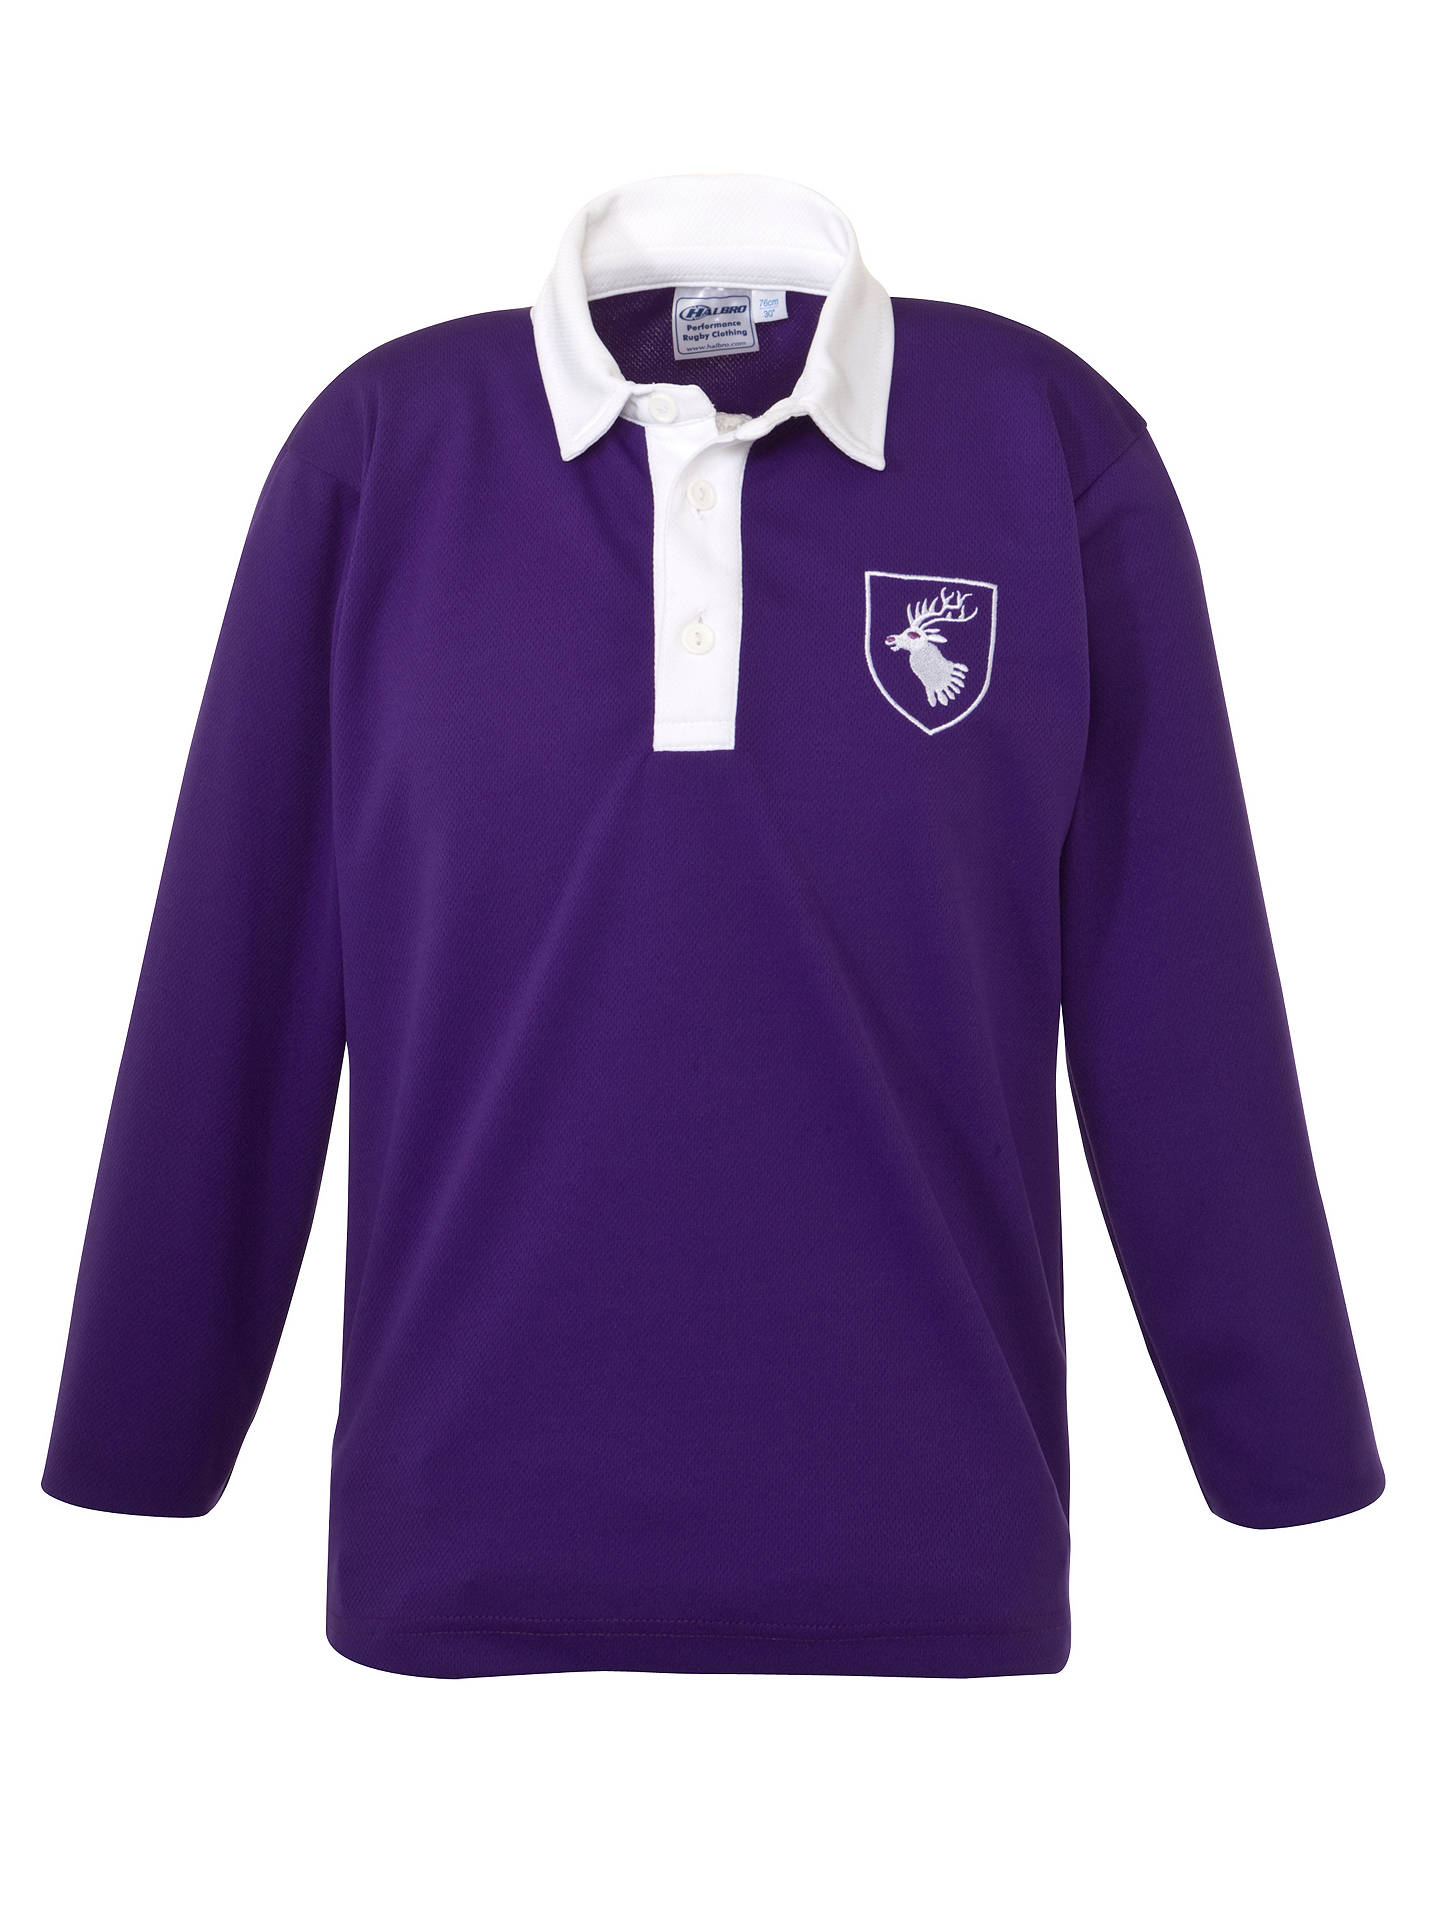 Daiglen School Long Sleeved Football Shirt Purple At John Lewis